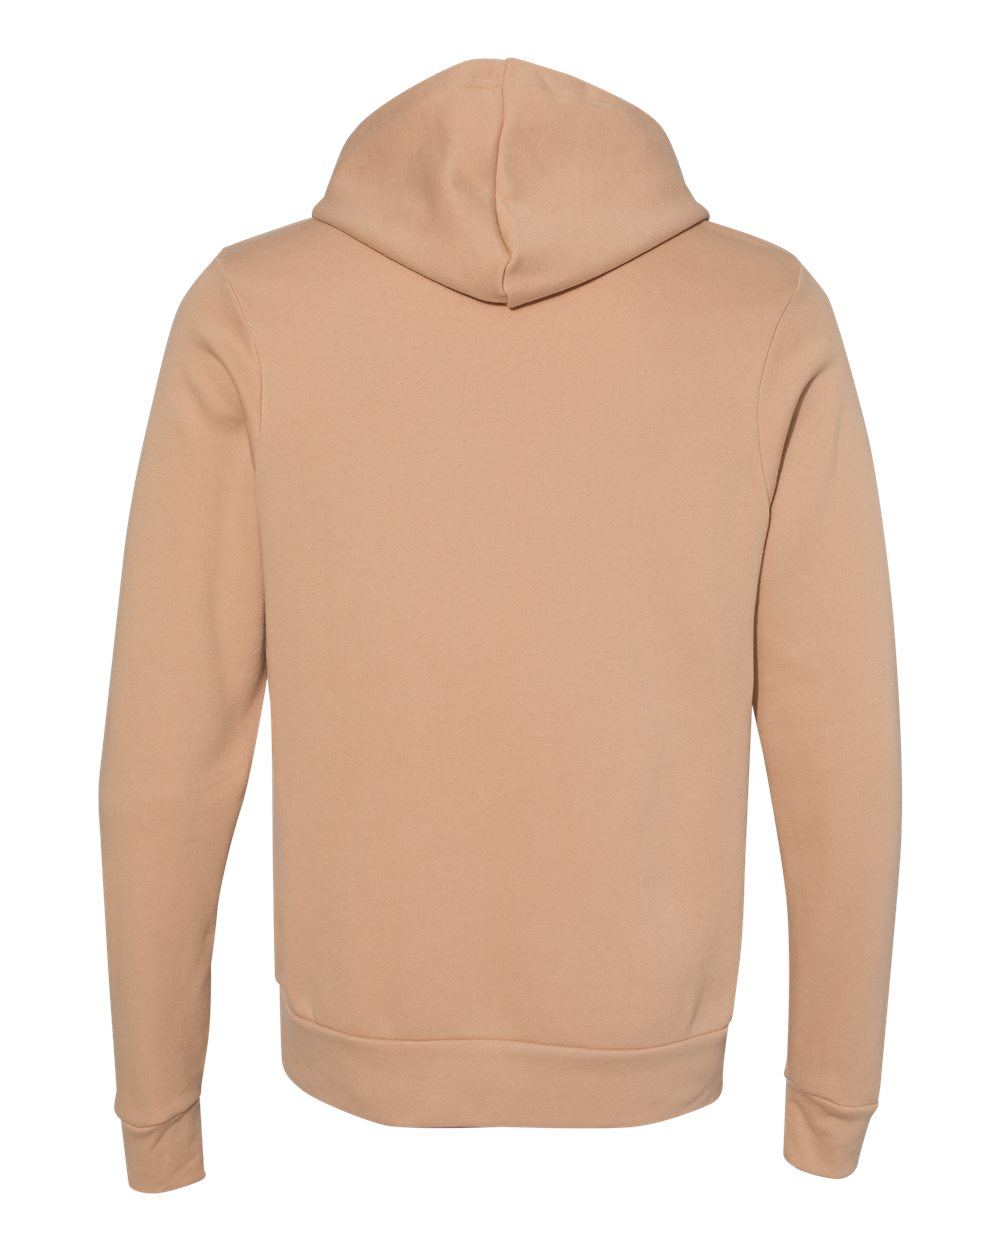 Bella-Canvas-Unisex-Sponge-Hooded-Pullover-Sweatshirt-Blank-3719-up-to-2XL thumbnail 58